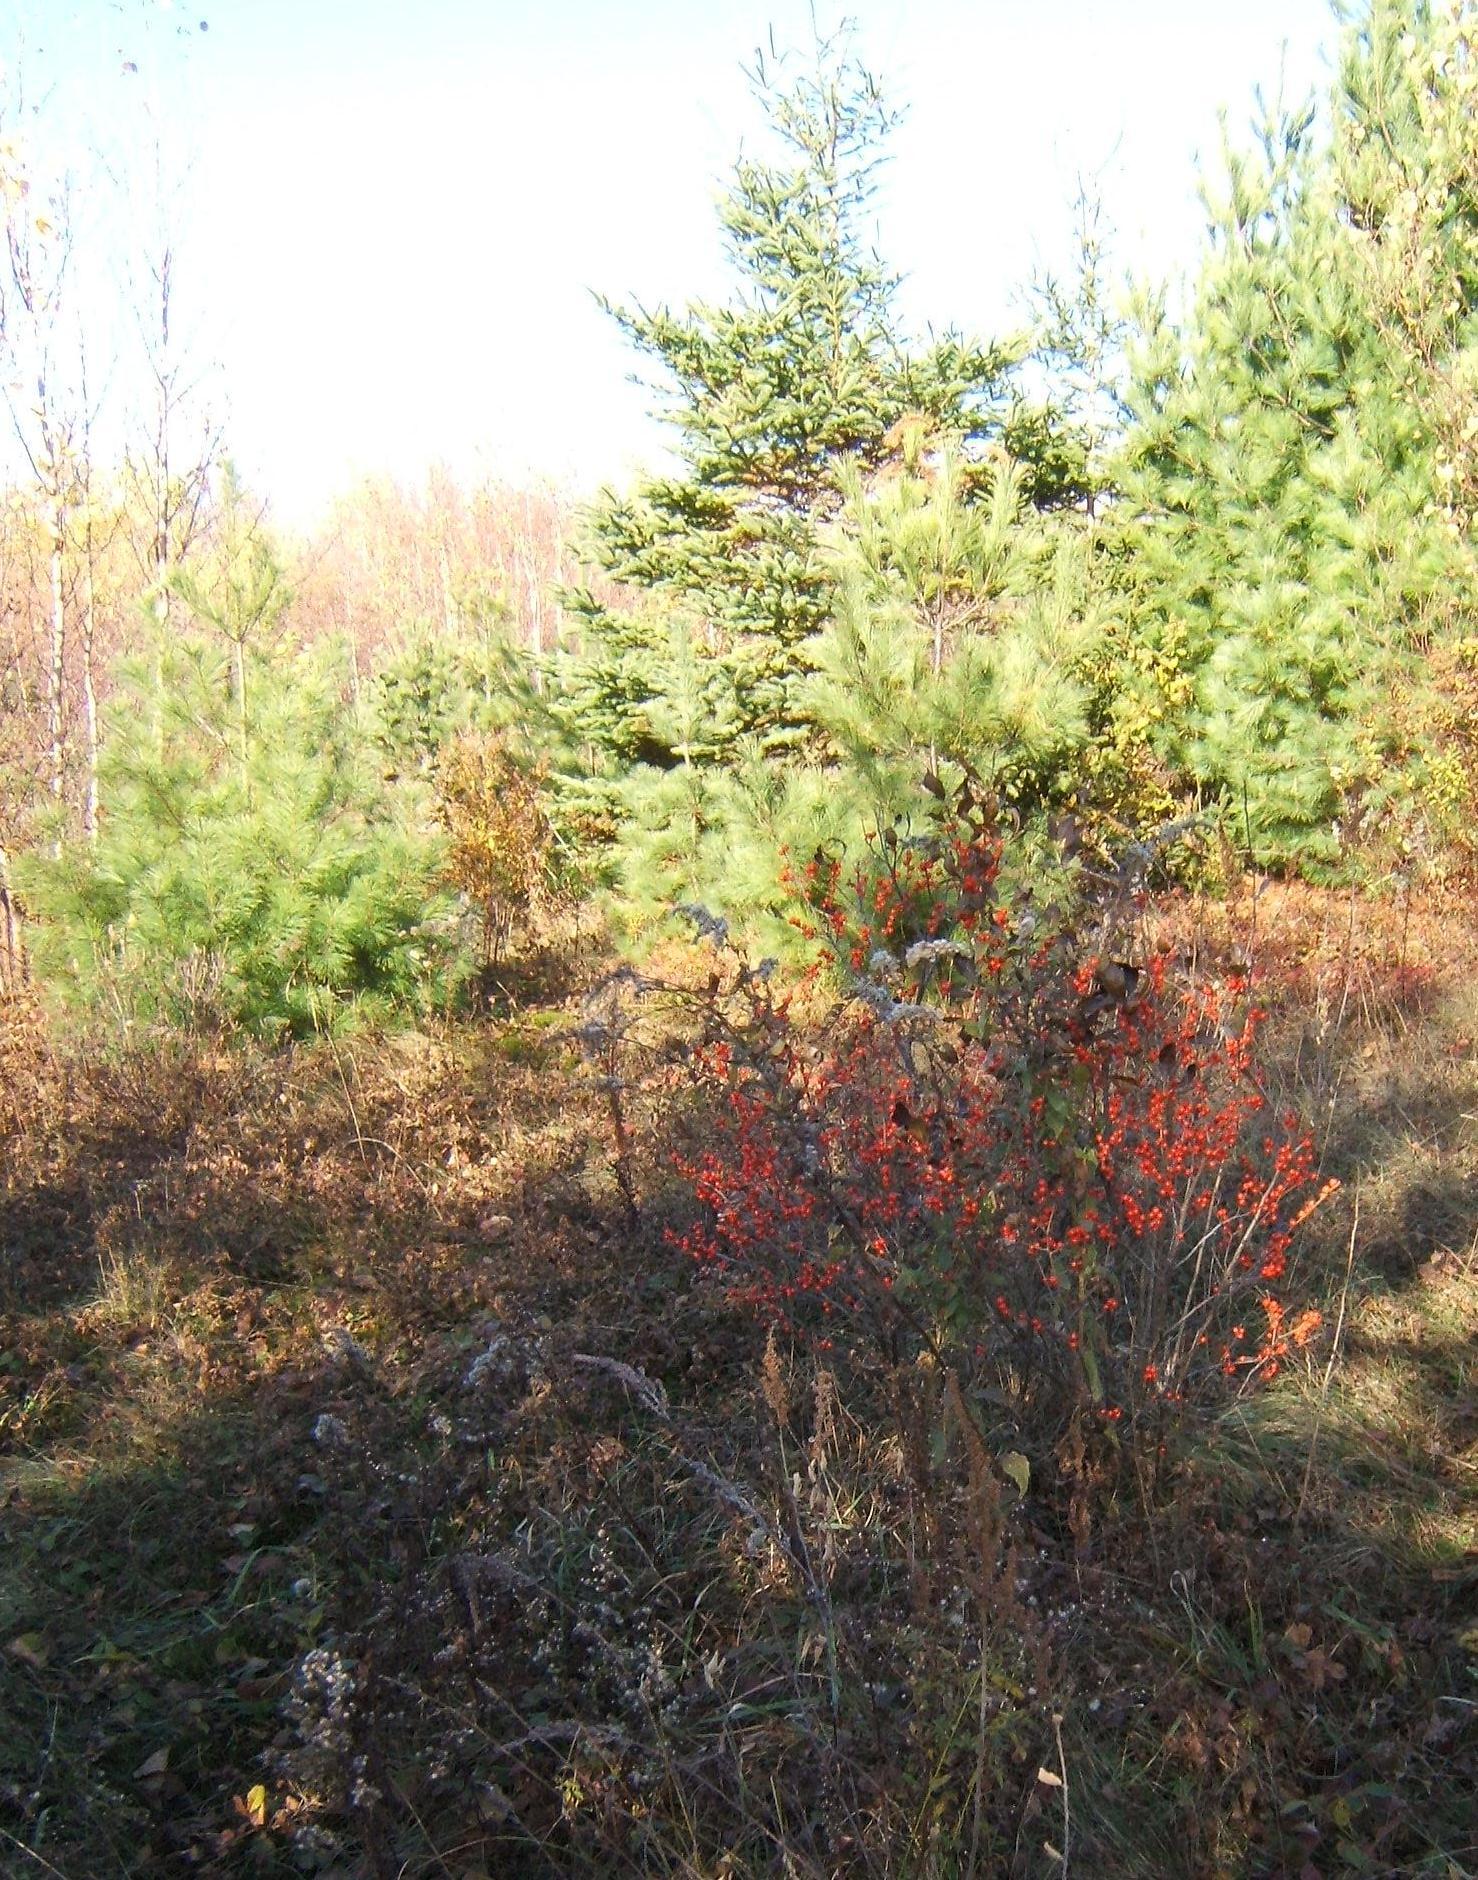 bush of winterberry holly